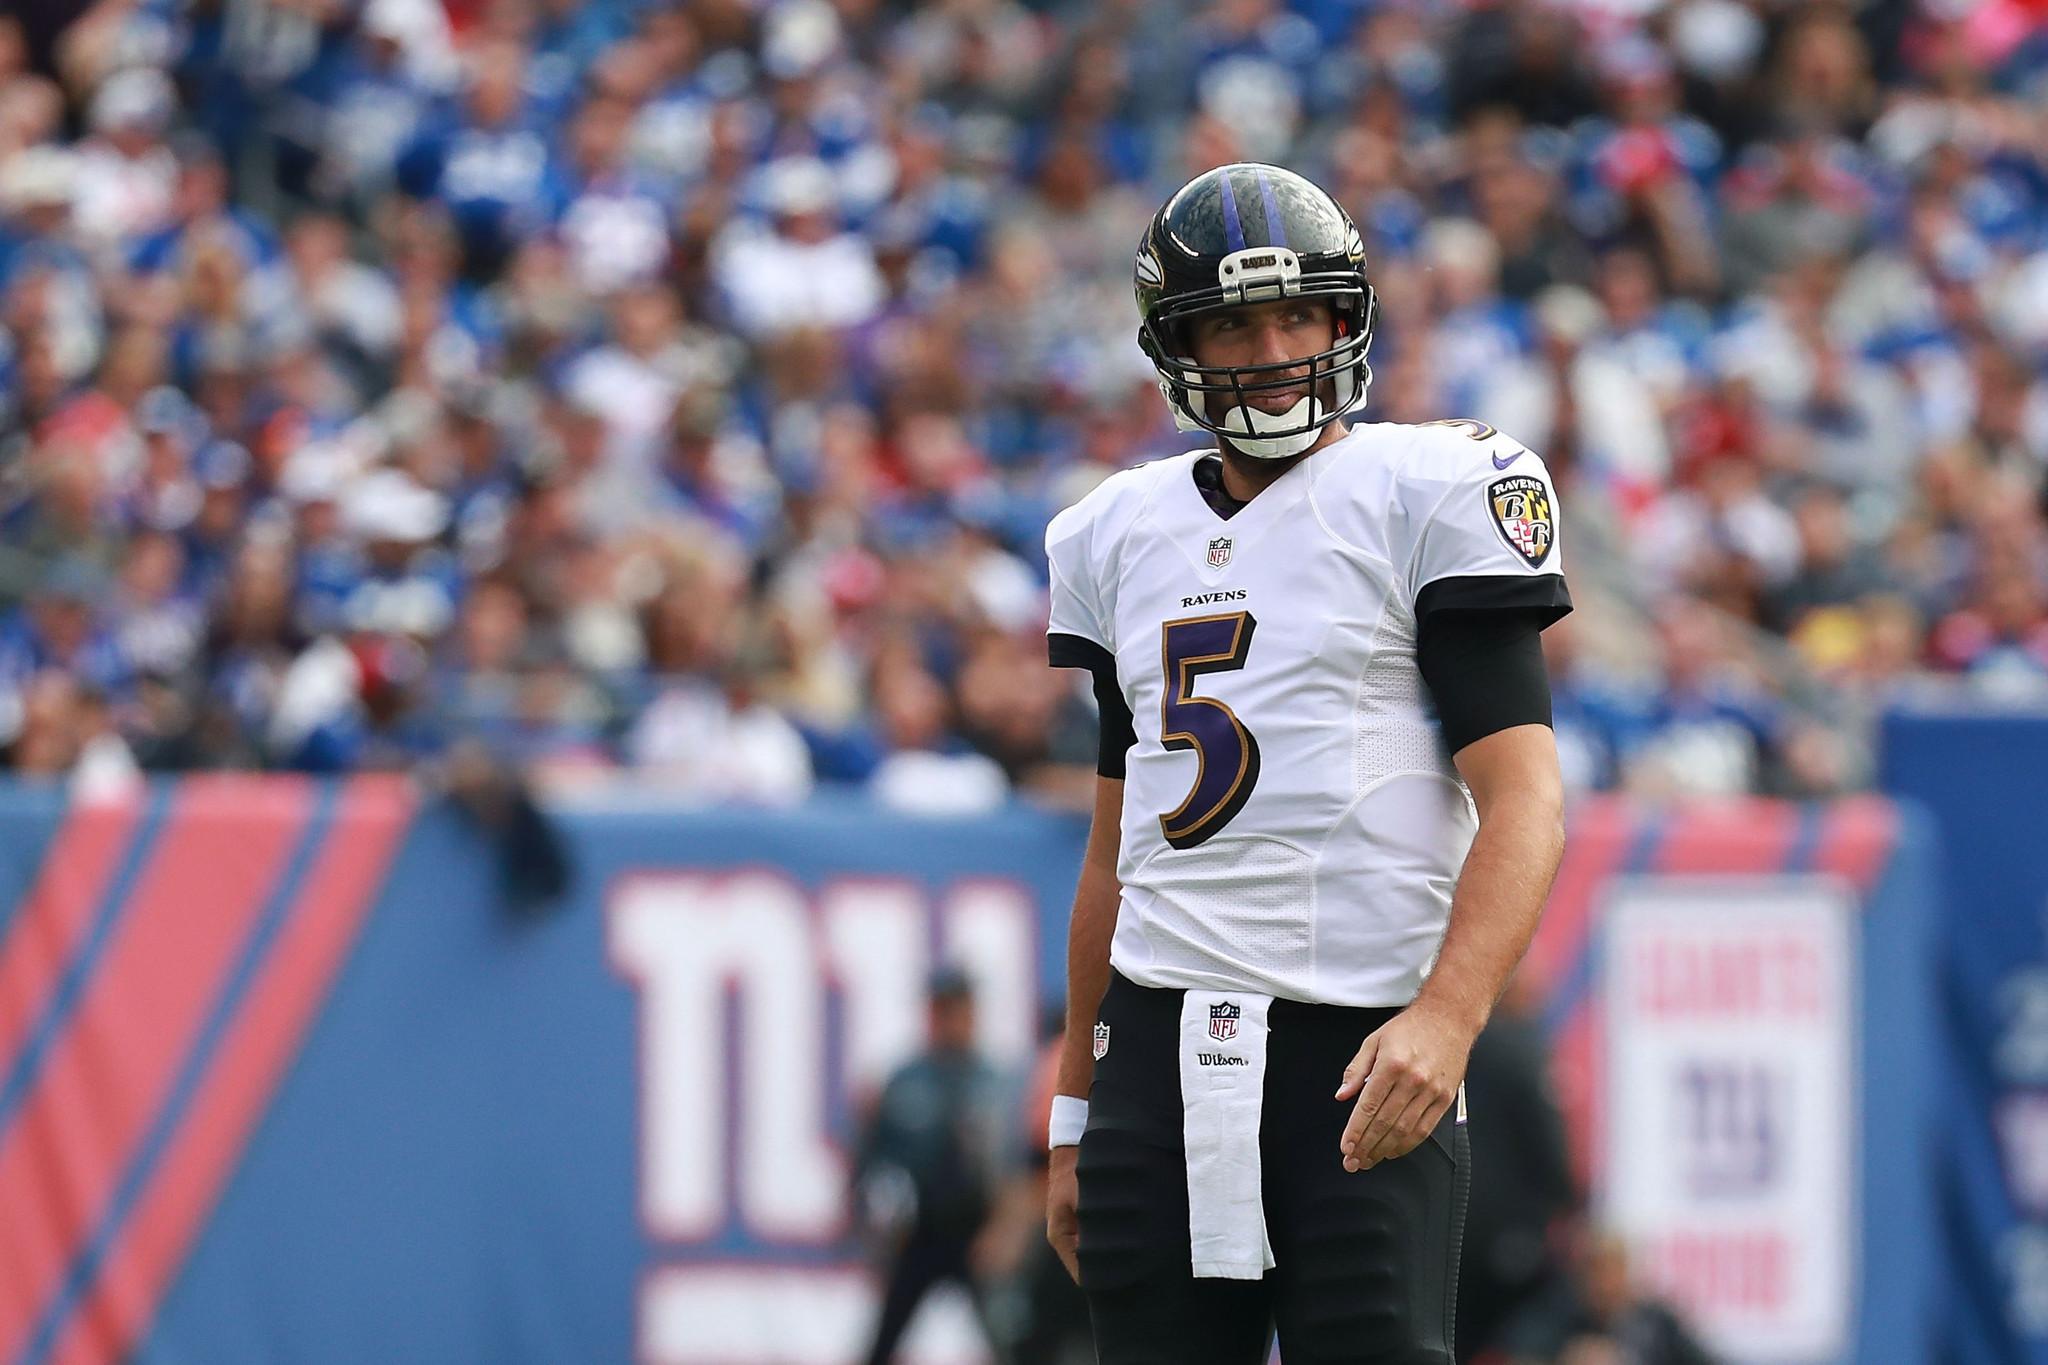 Quarterback Joe Flacco missing again from Ravens practice on